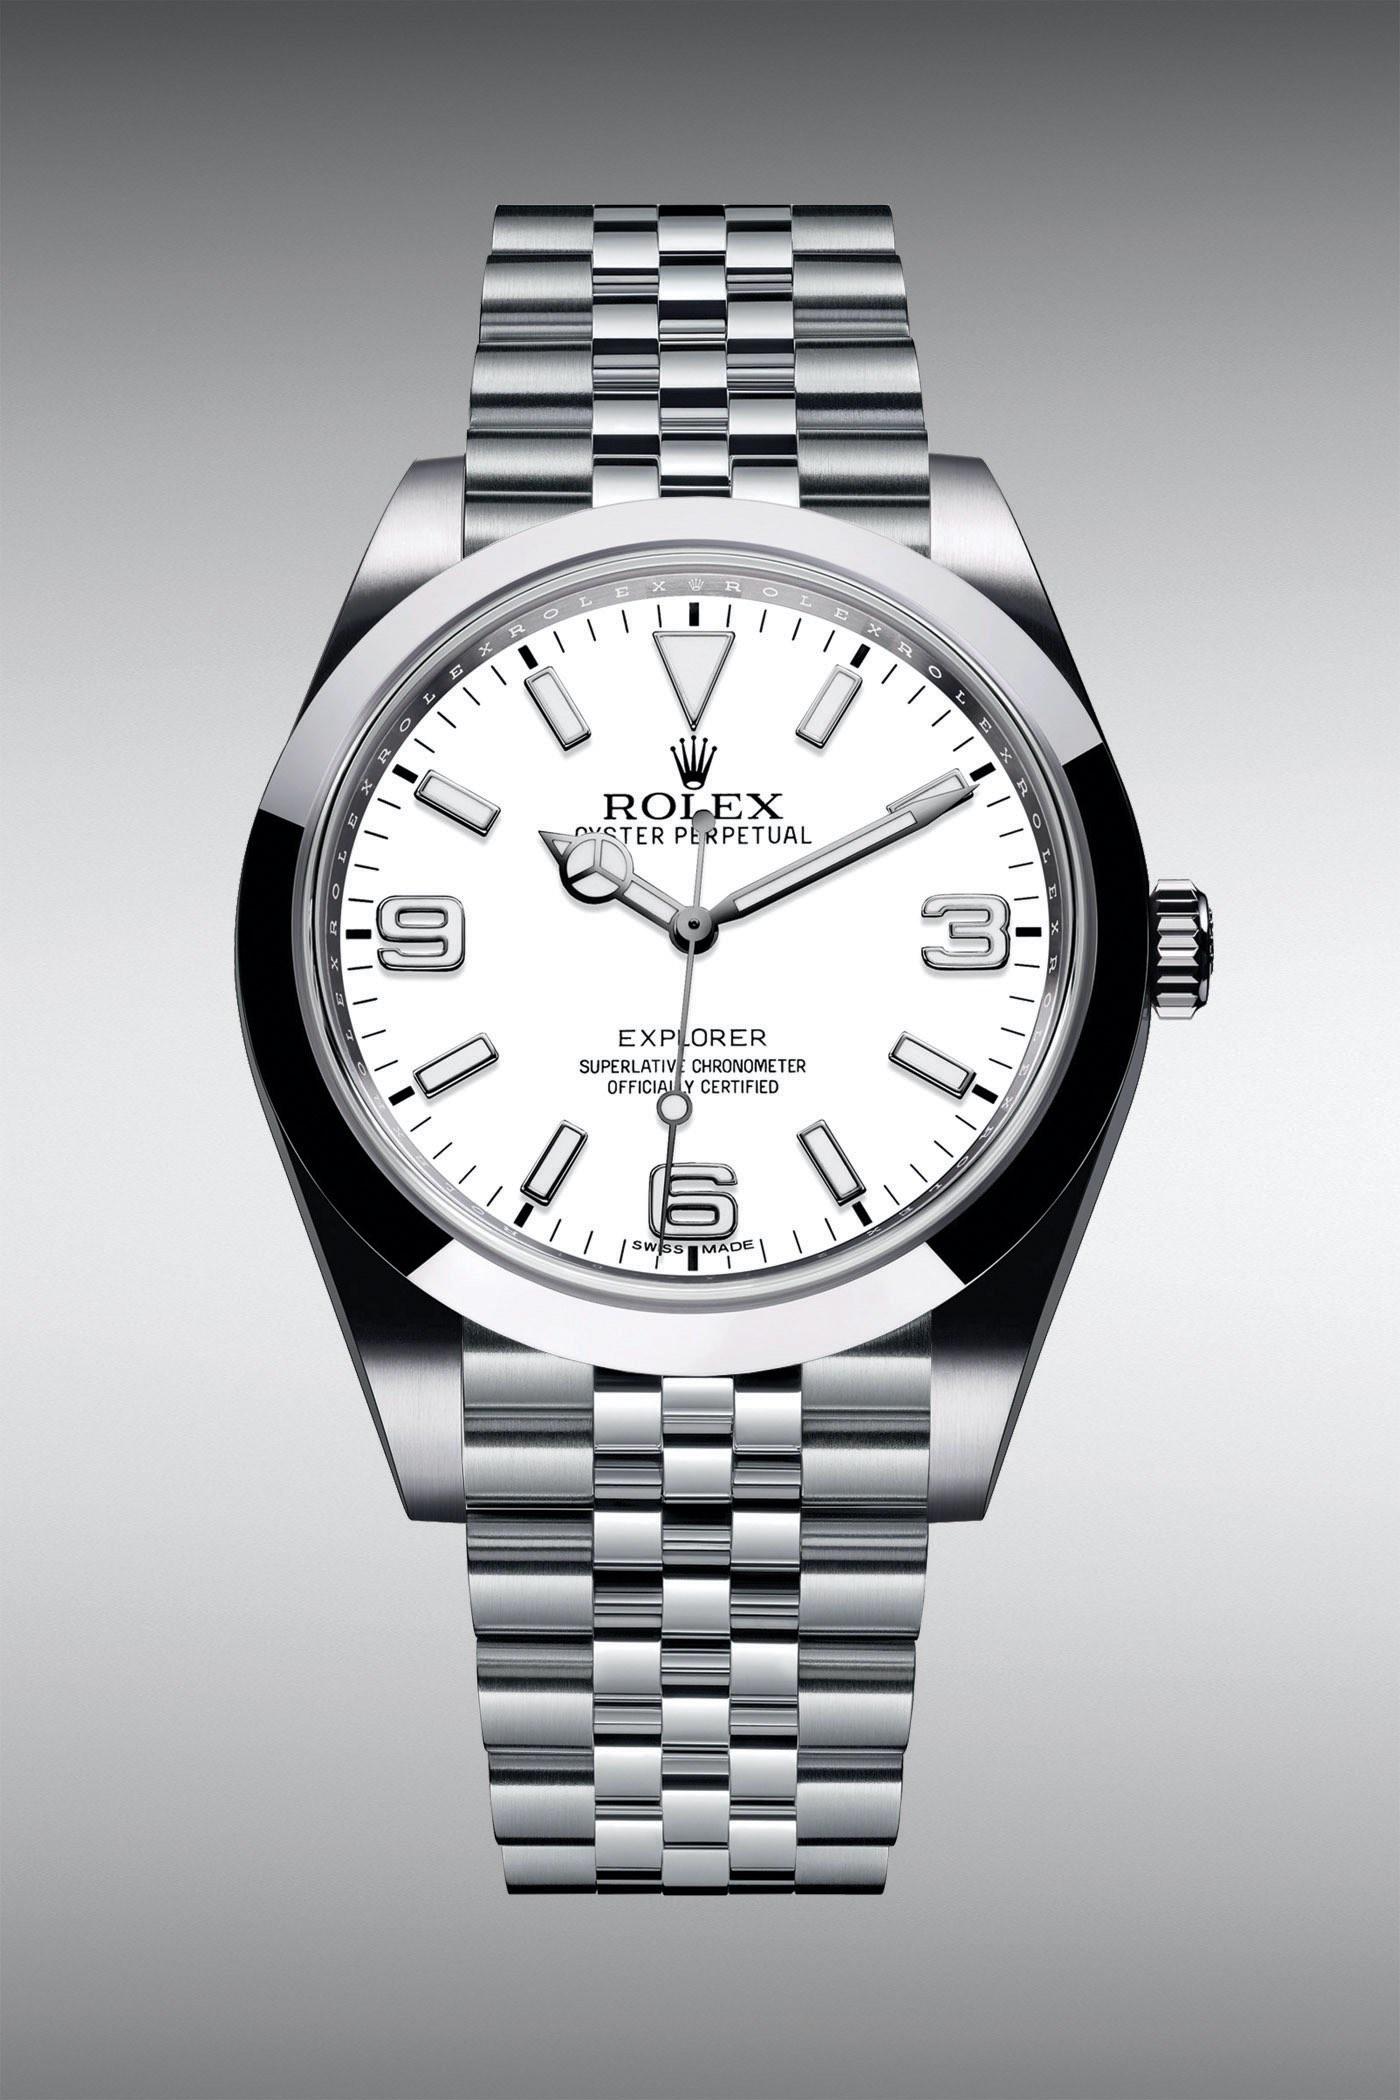 Rolex Explorer 39 Polar White Dial Jubilee Bracelet - Rolex Baselworld 2020 - Rolex 2020 Predictions